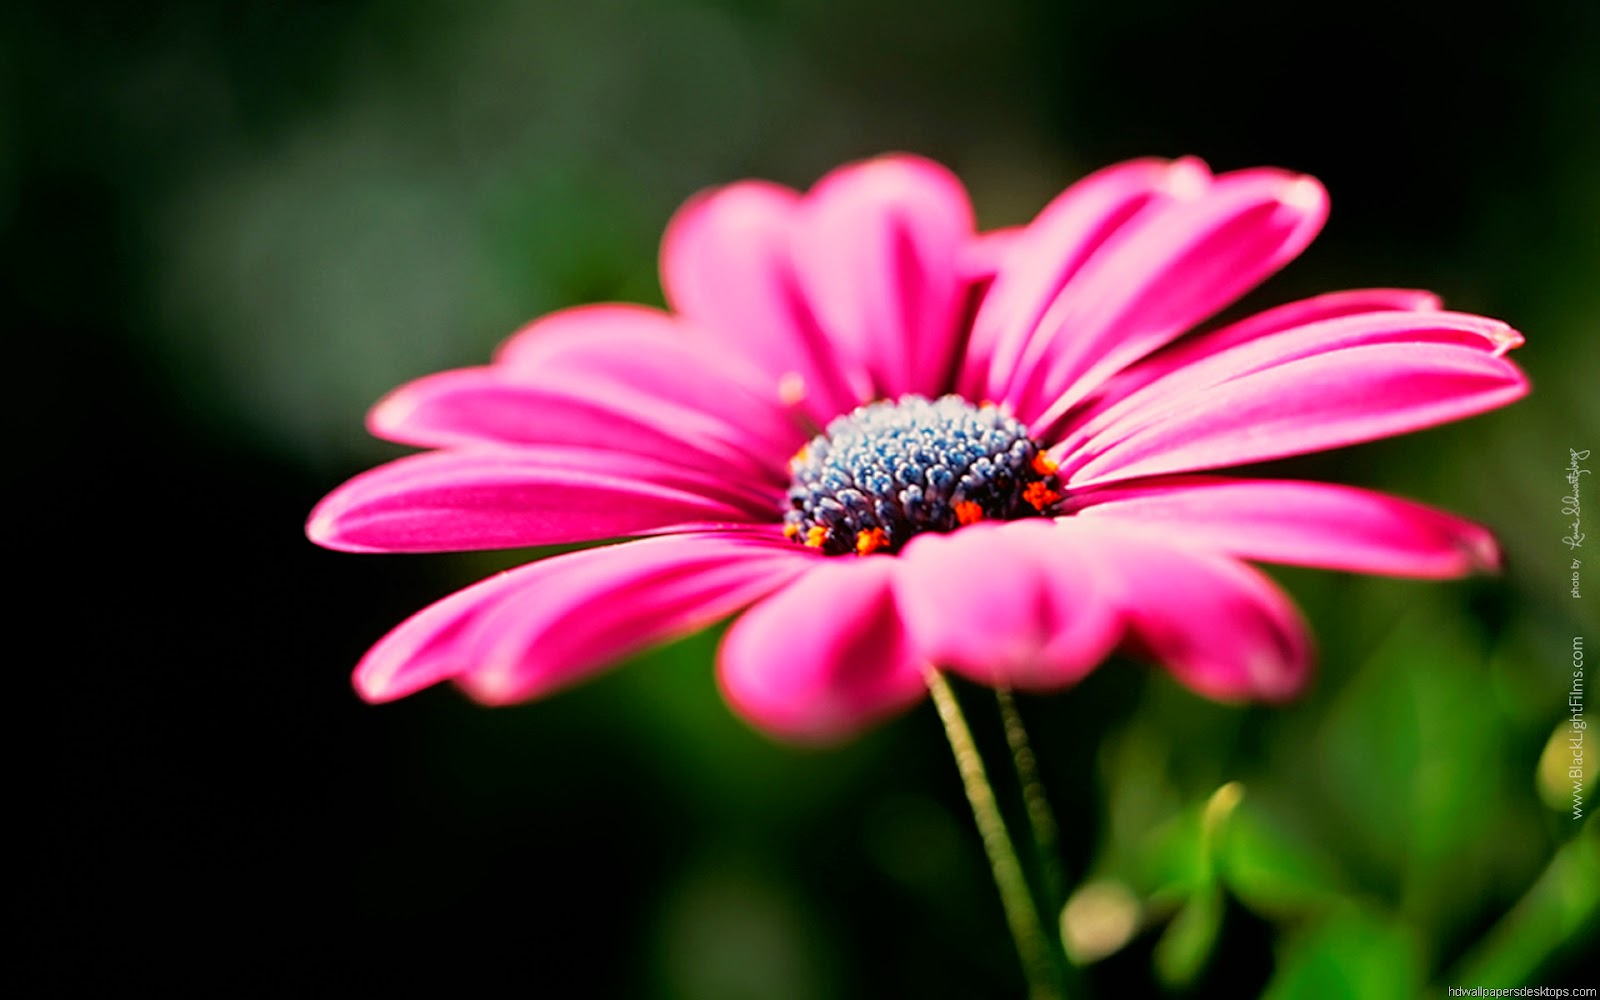 Hd Flower Backgrounds: Best Wallpaper: Beautiful Flowers Hd Wallpapers Free Download